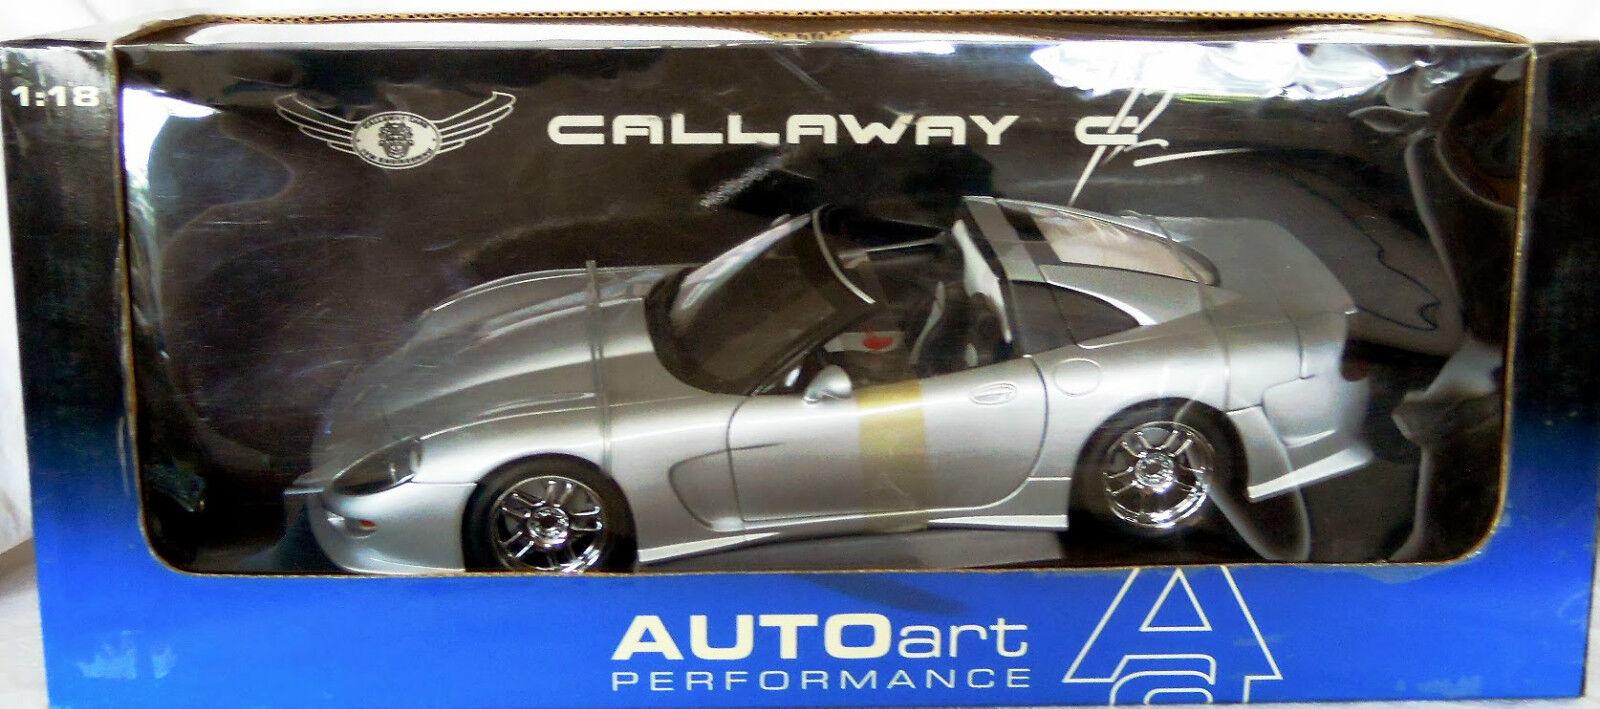 Autoart 71011  chevrolet corvette callaway c12, druckguss in 1   18, neu - und ovp